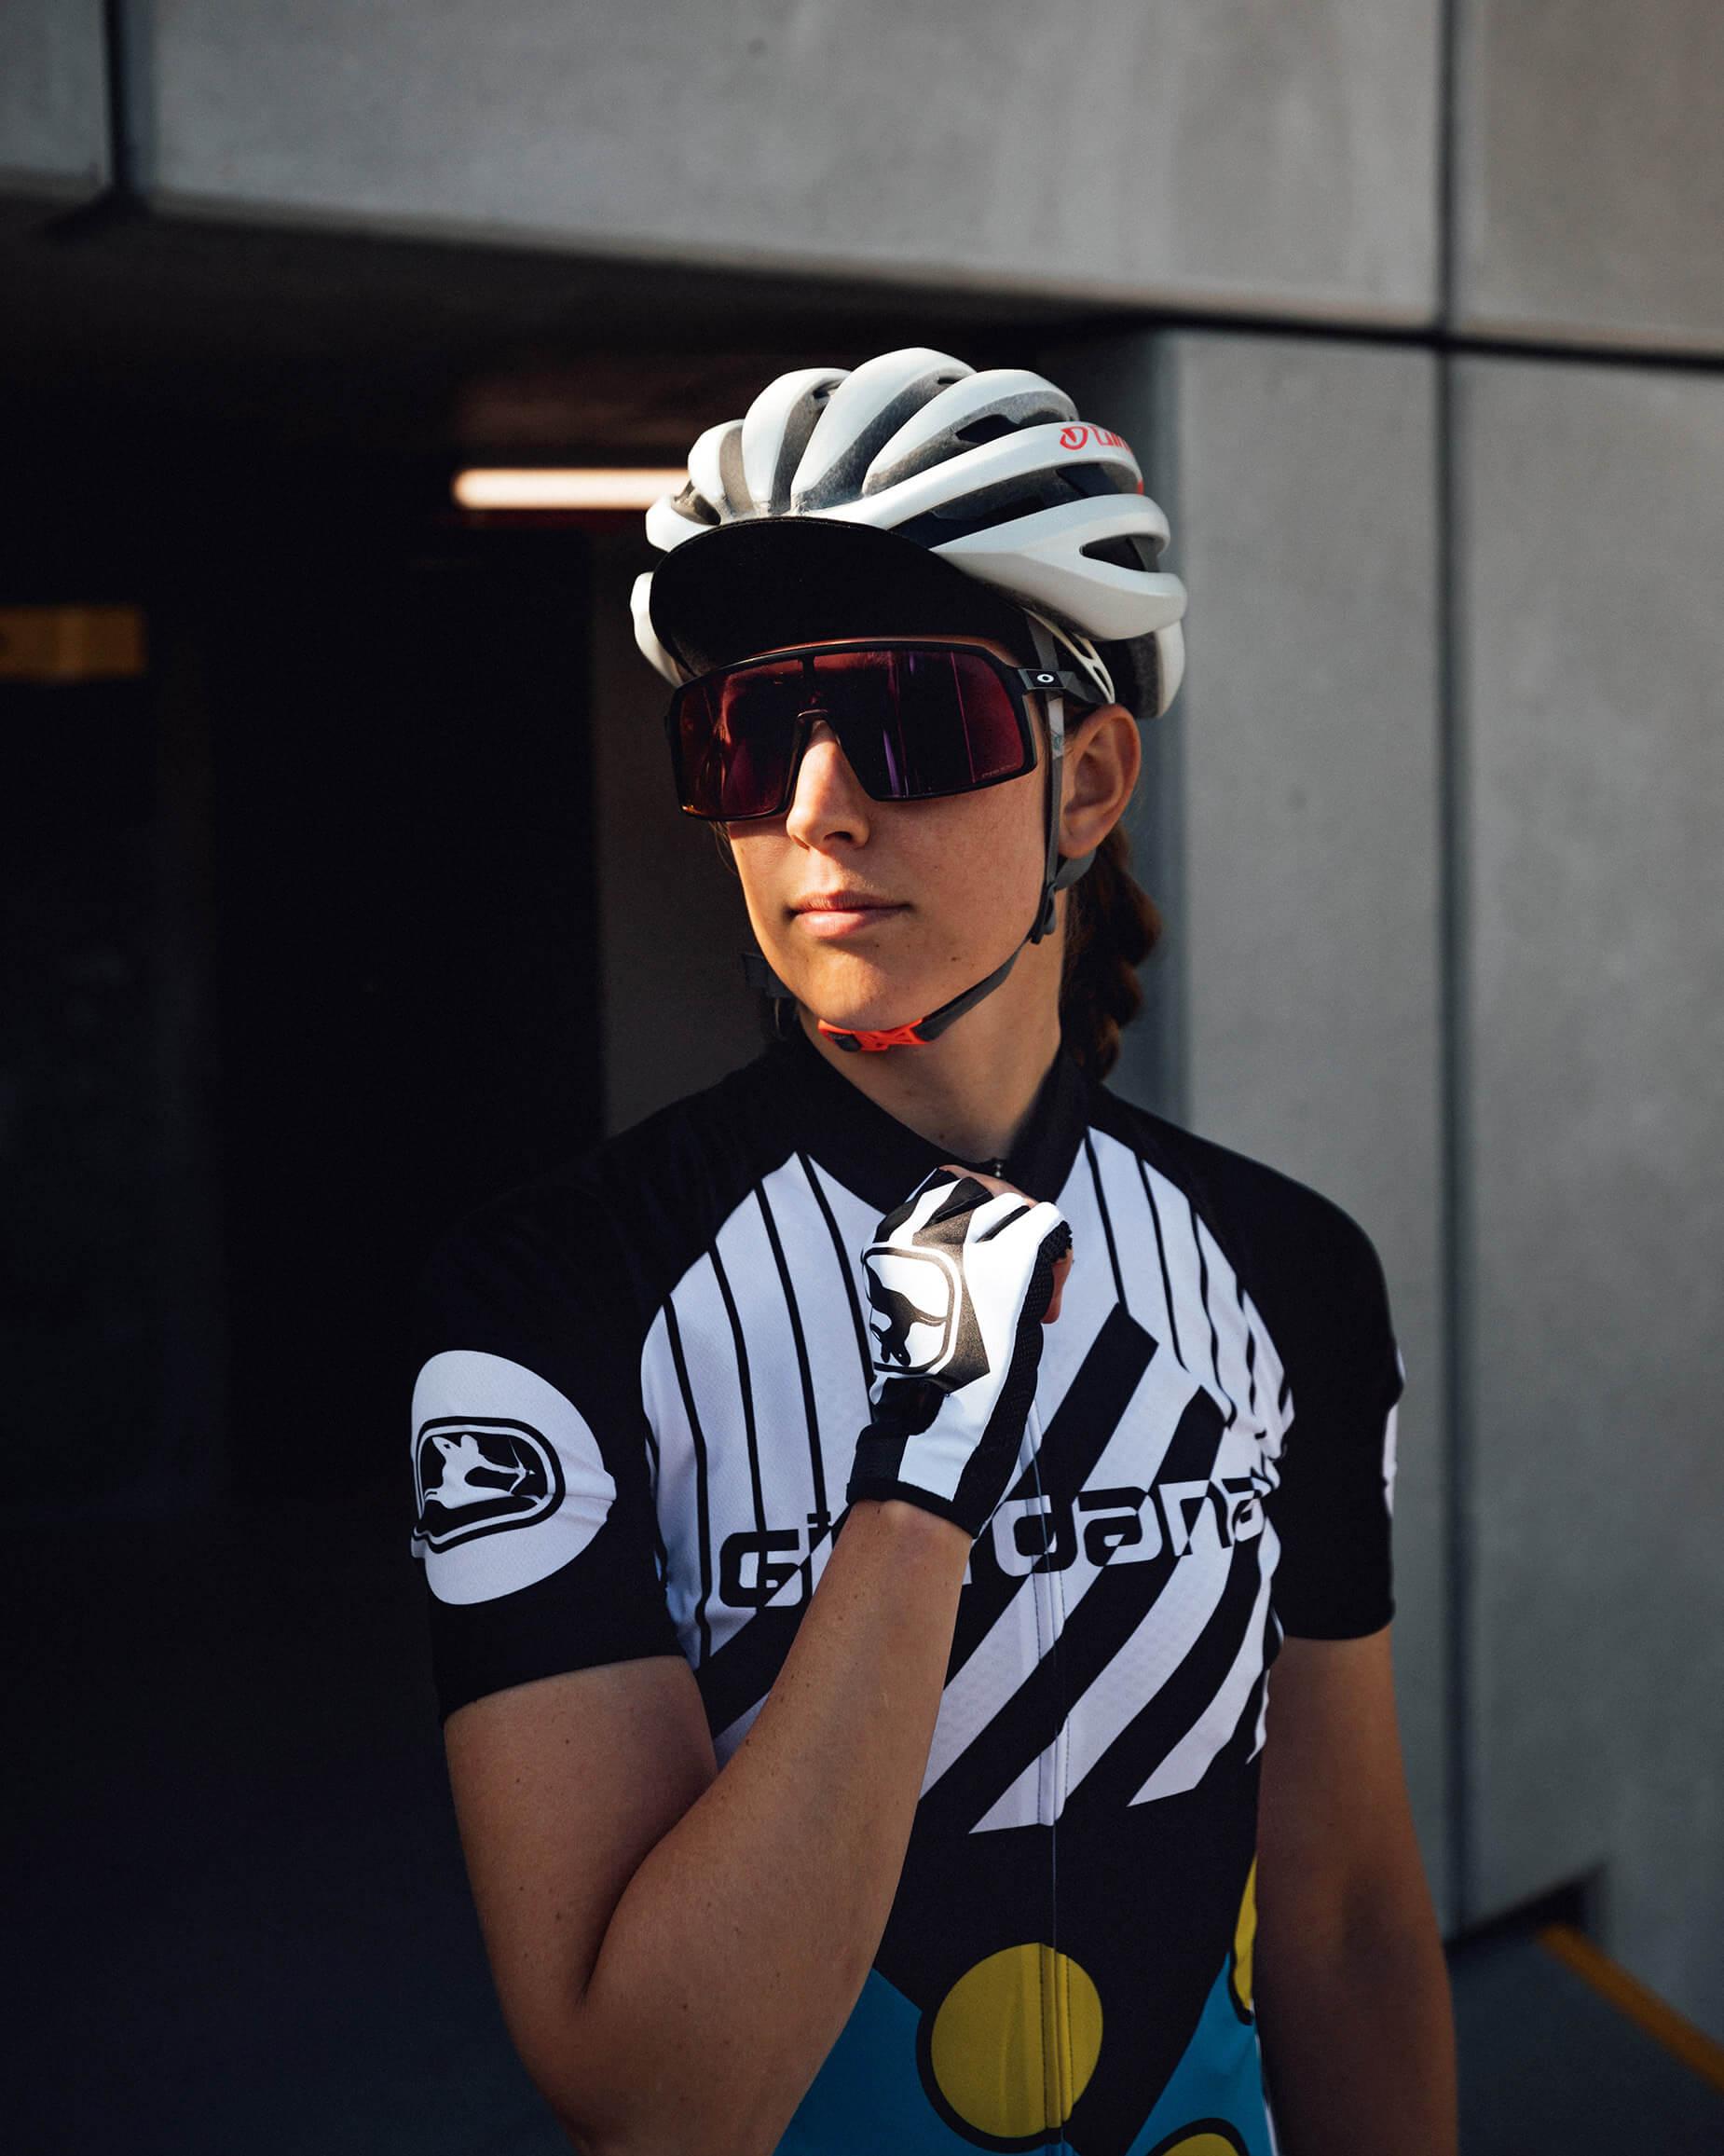 giordana-cycling-moda-retro-lookbook-portrait-3-motivo-black